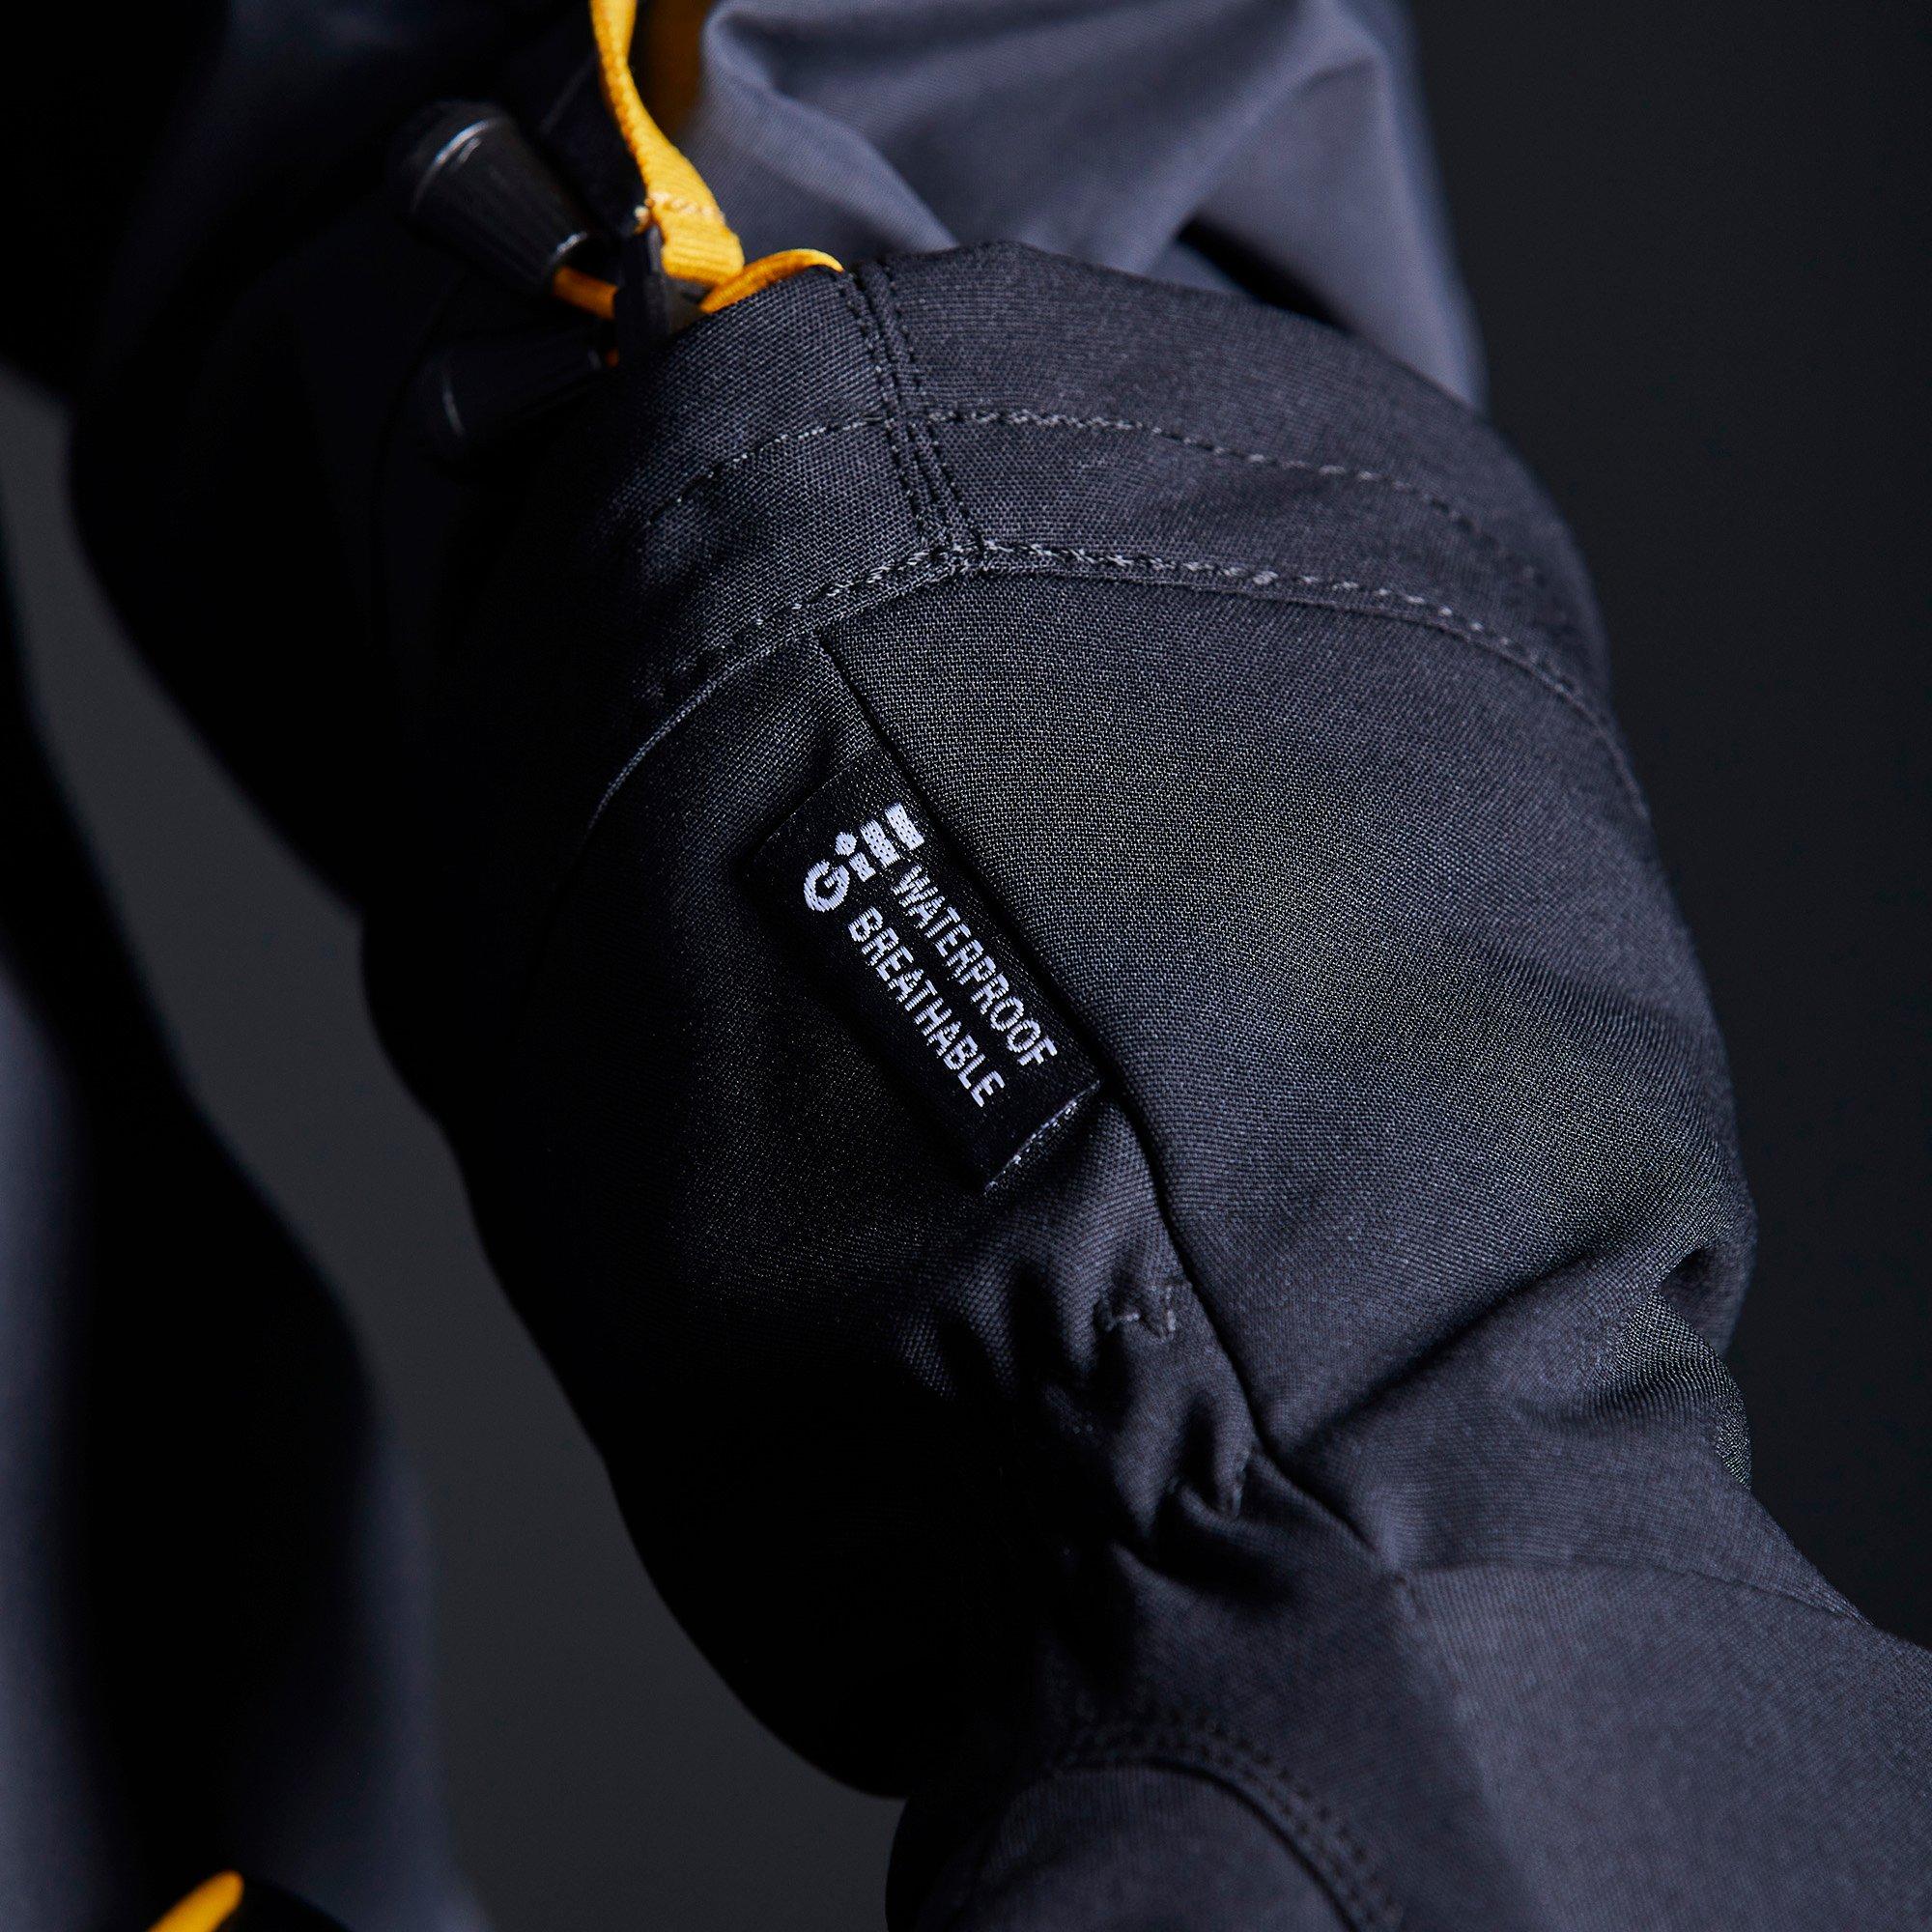 Helmsman-Handschuhe - 7805-BLK01-MODEL_3.jpg